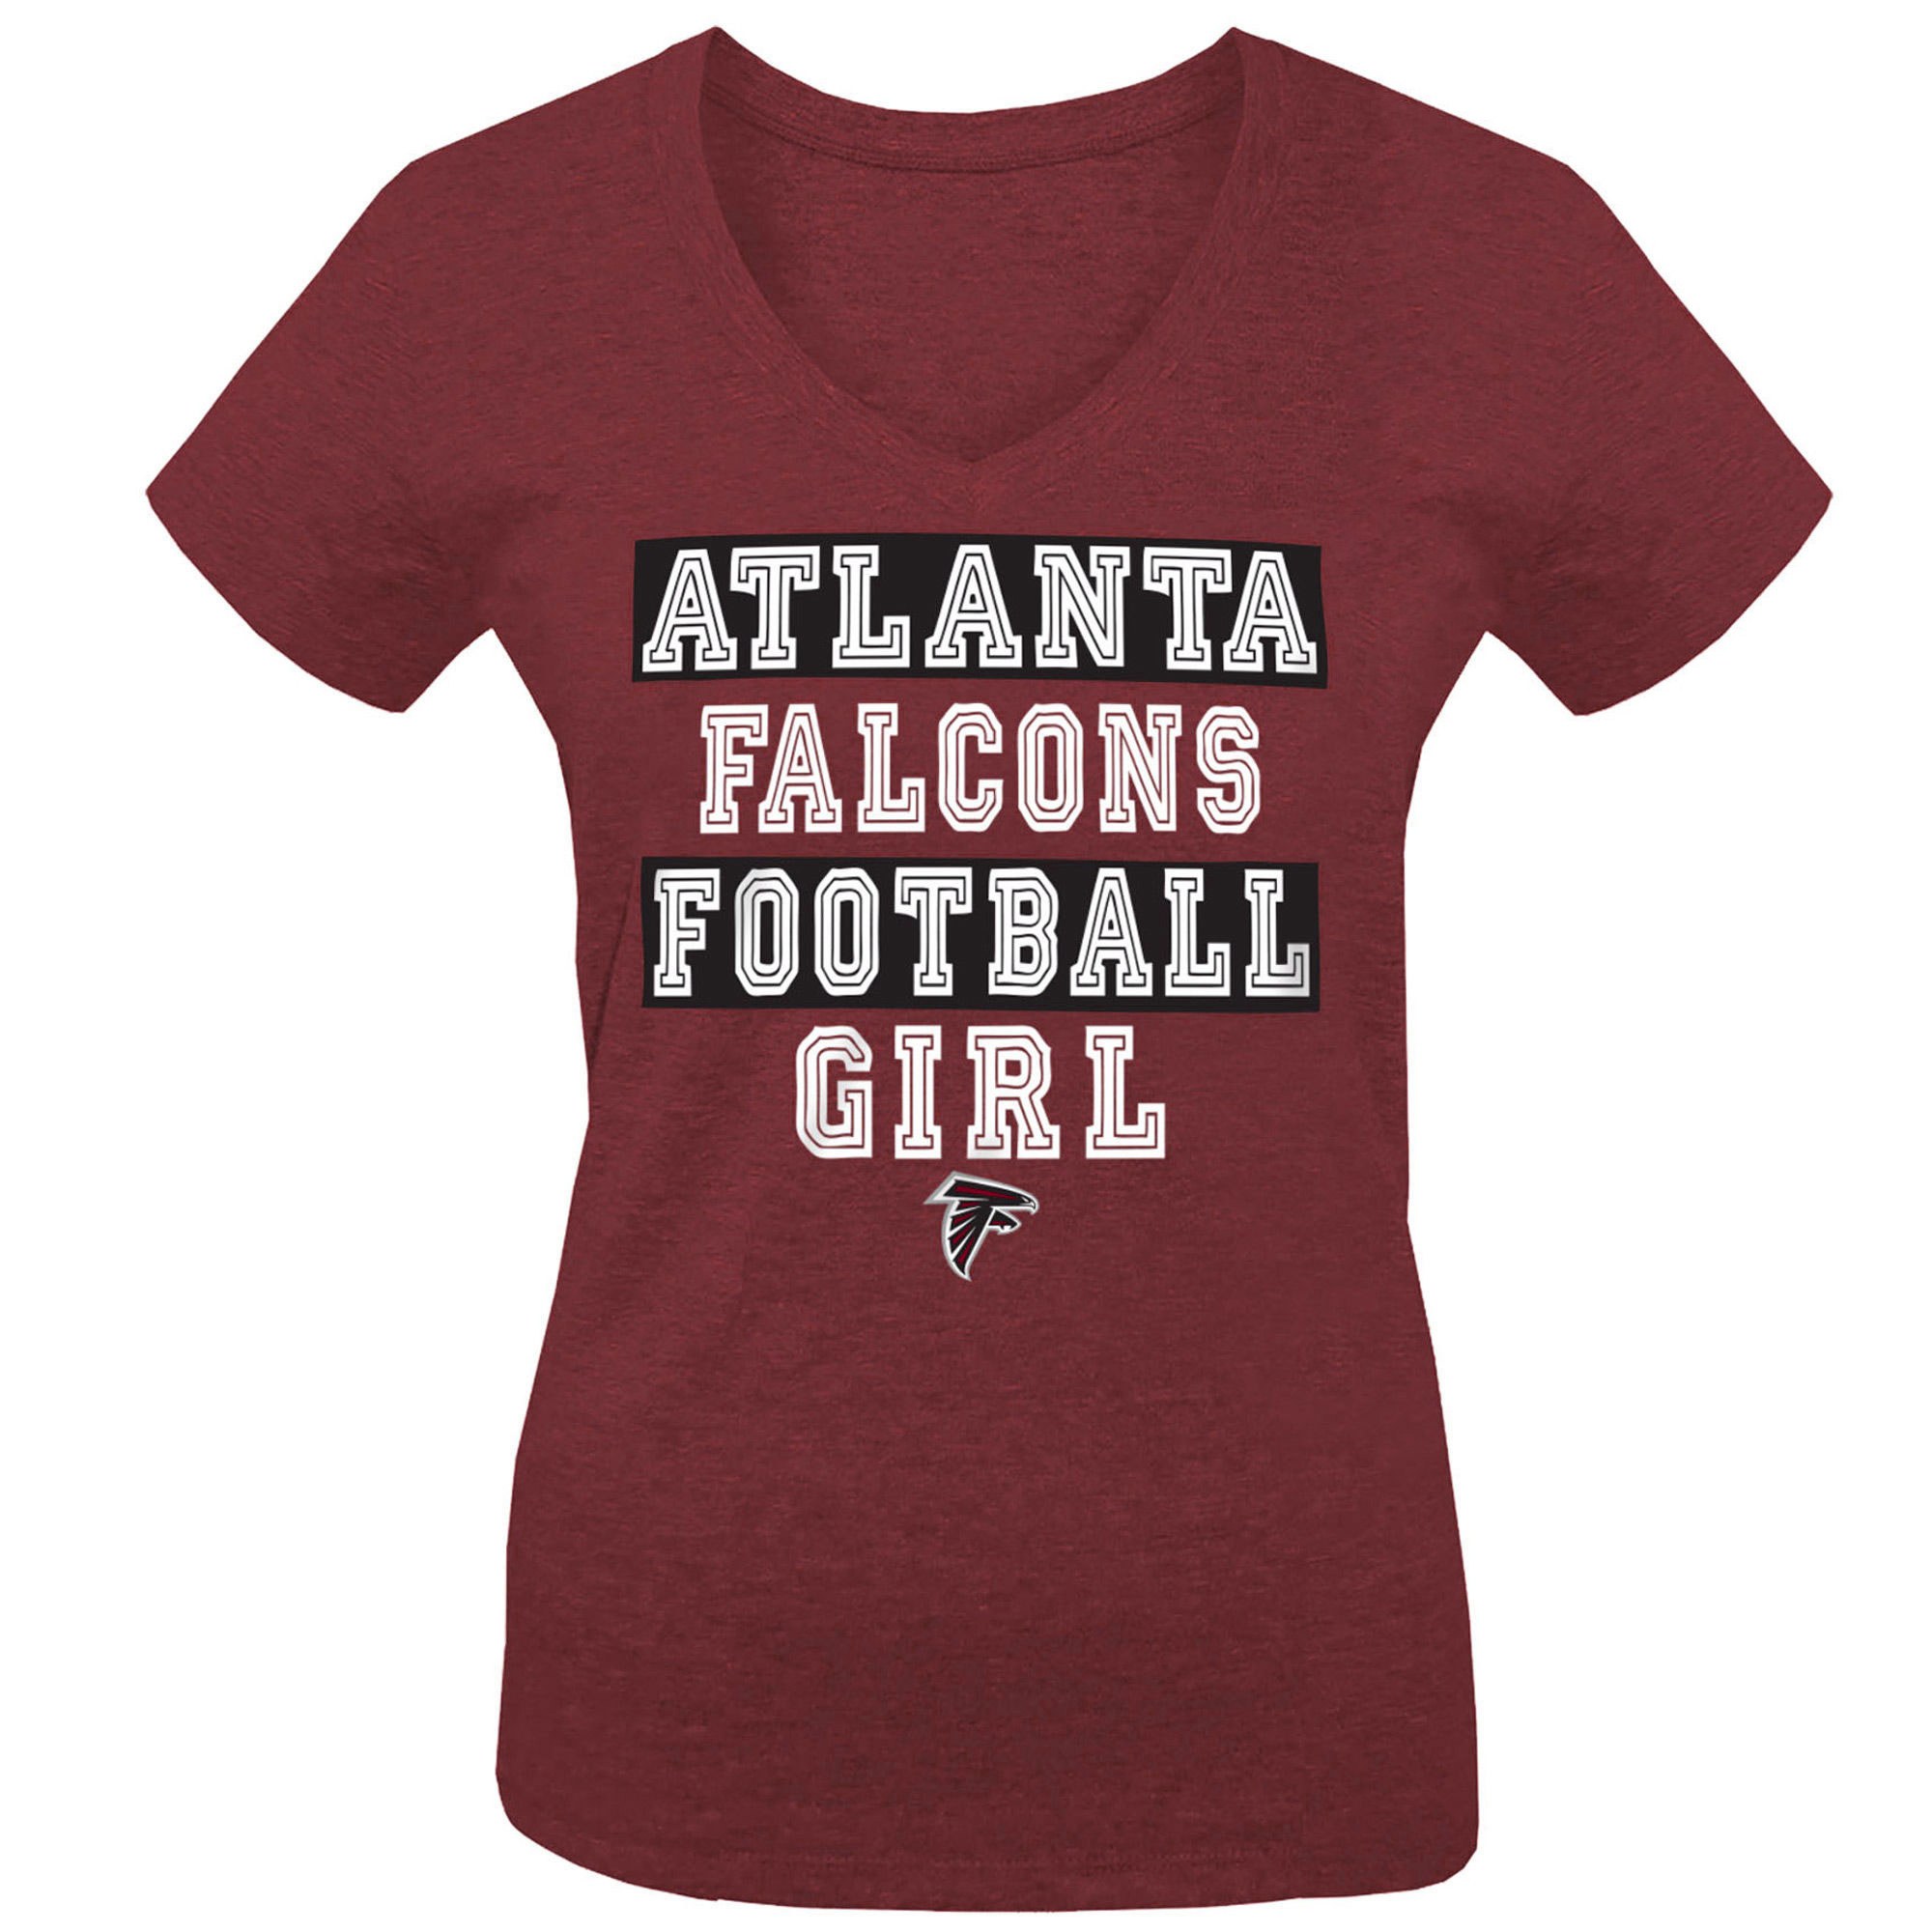 Atlanta Falcons 5th & Ocean by New Era Girls Youth Football Girl Tri-Blend V-Neck T-Shirt - Red